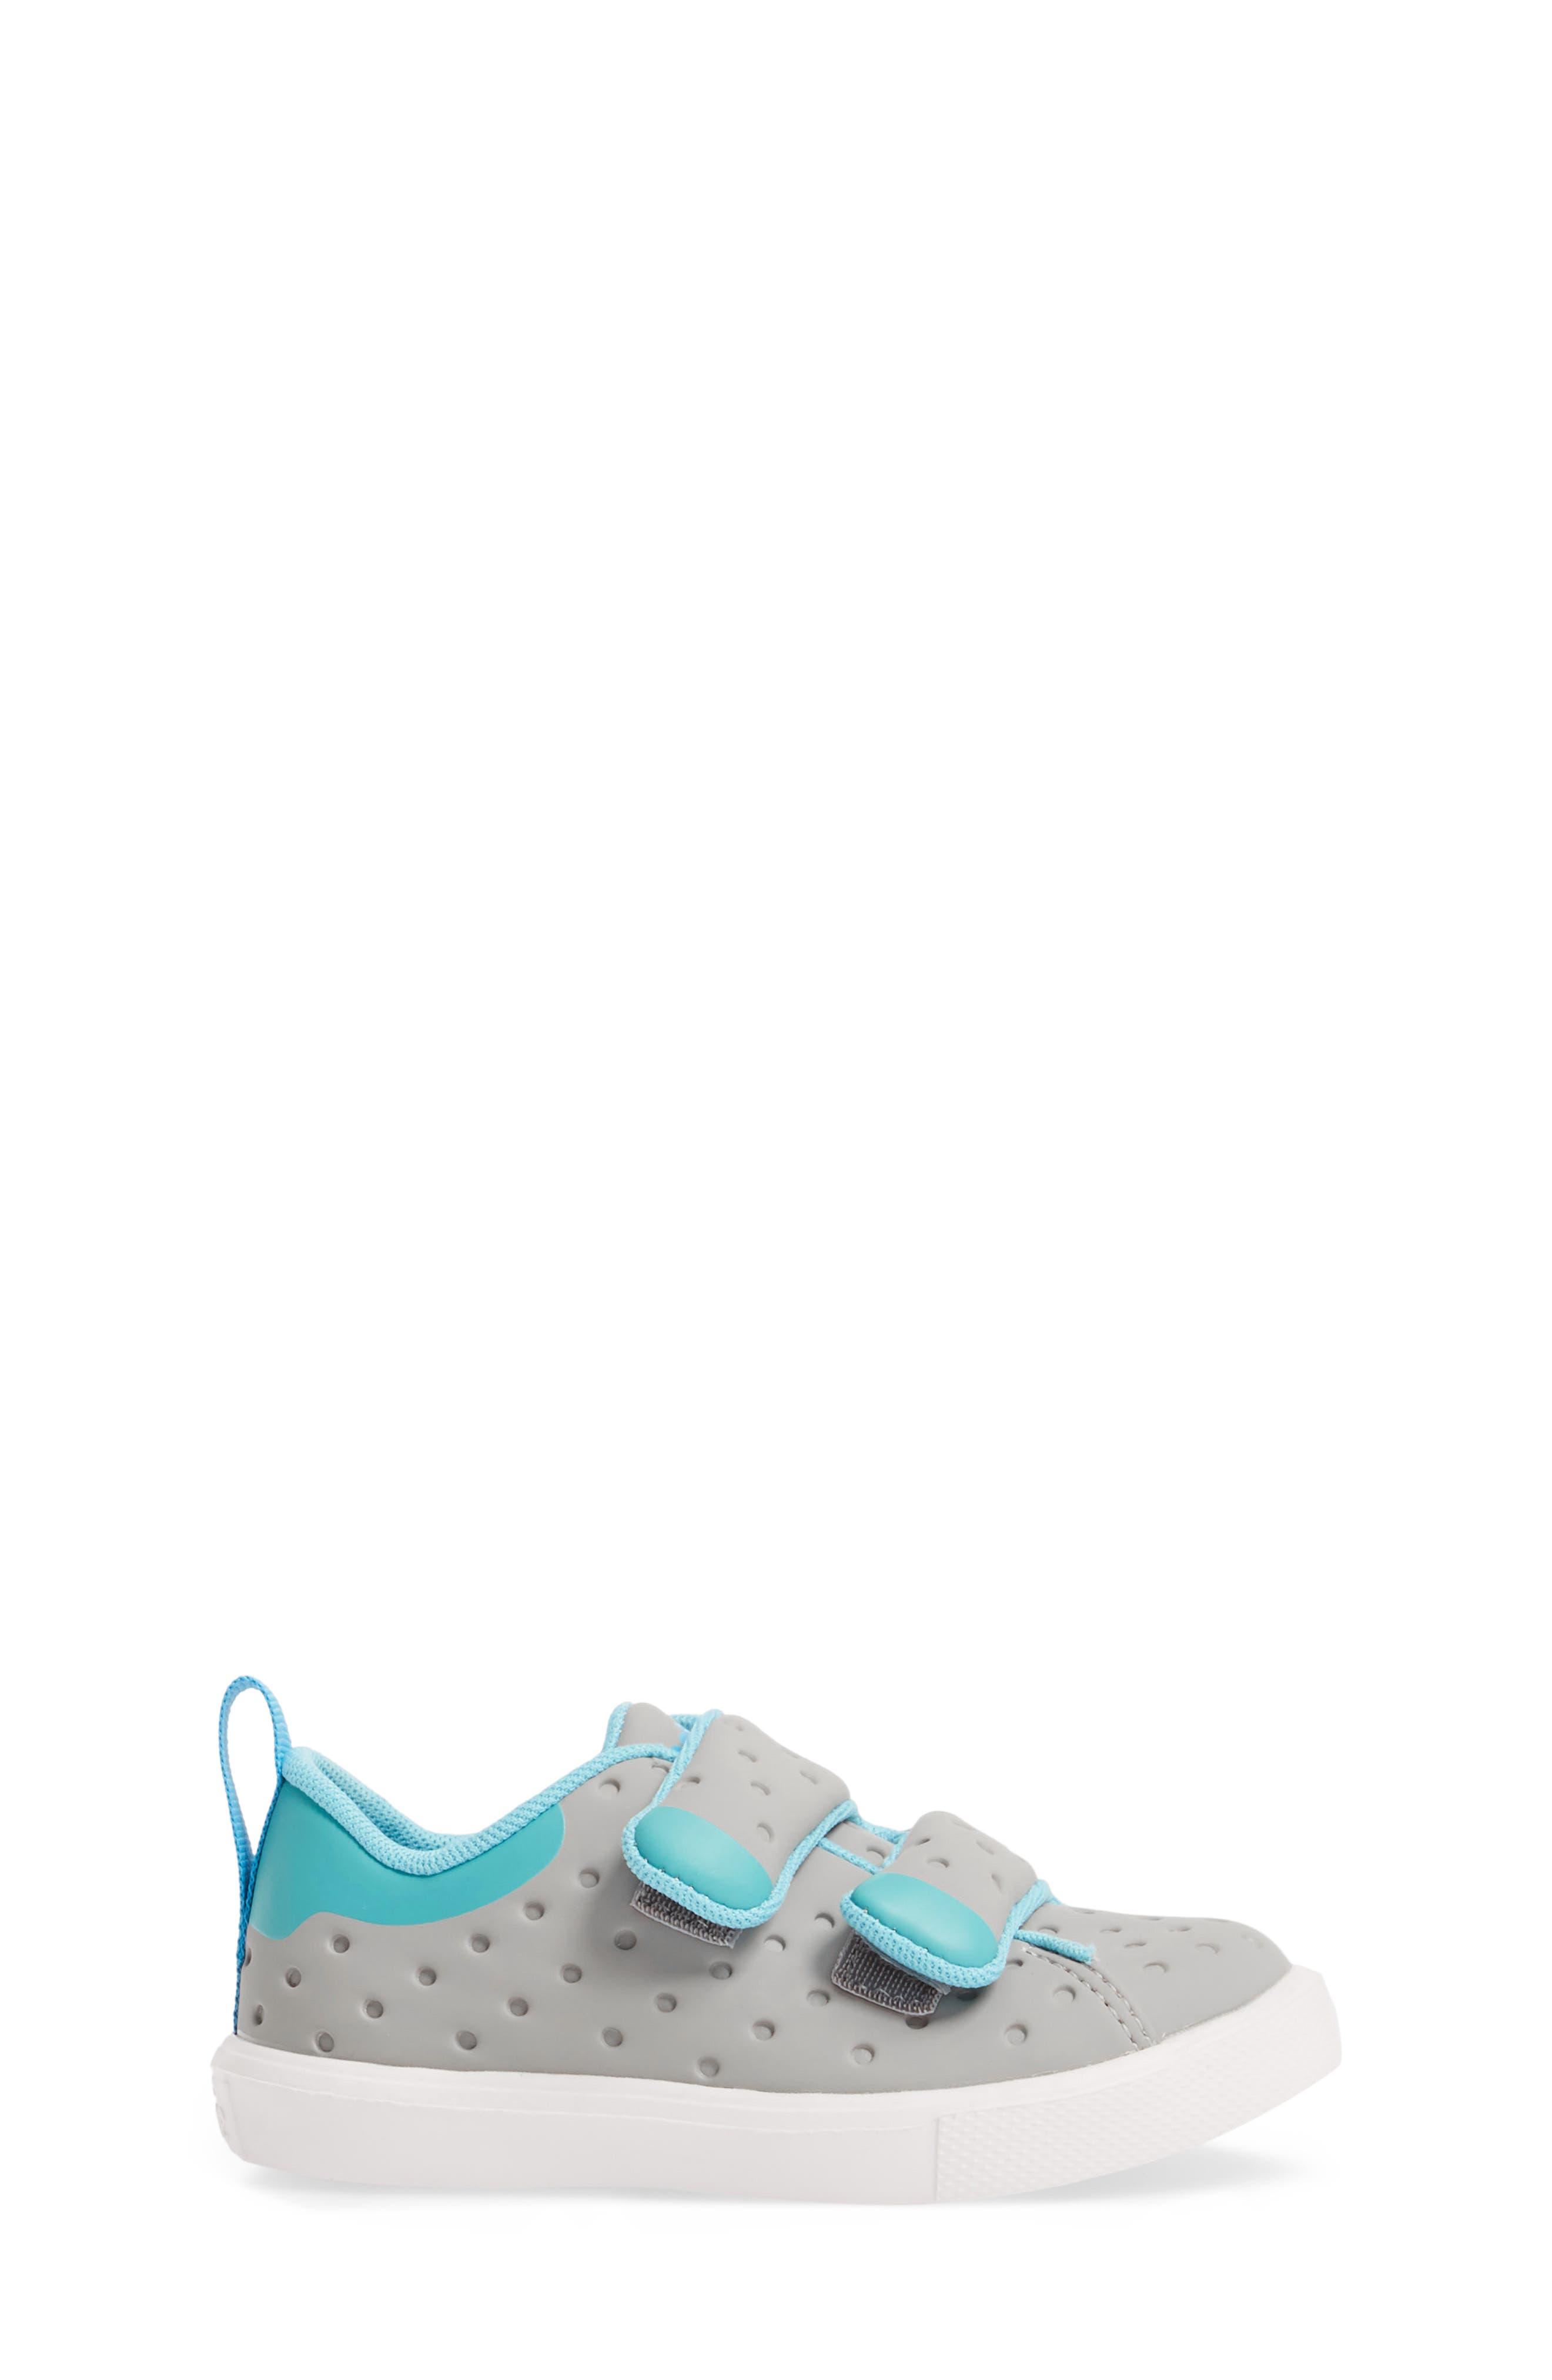 Monaco Sneaker,                             Alternate thumbnail 3, color,                             PIGEON GREY/ POOL BOOL/ WHITE